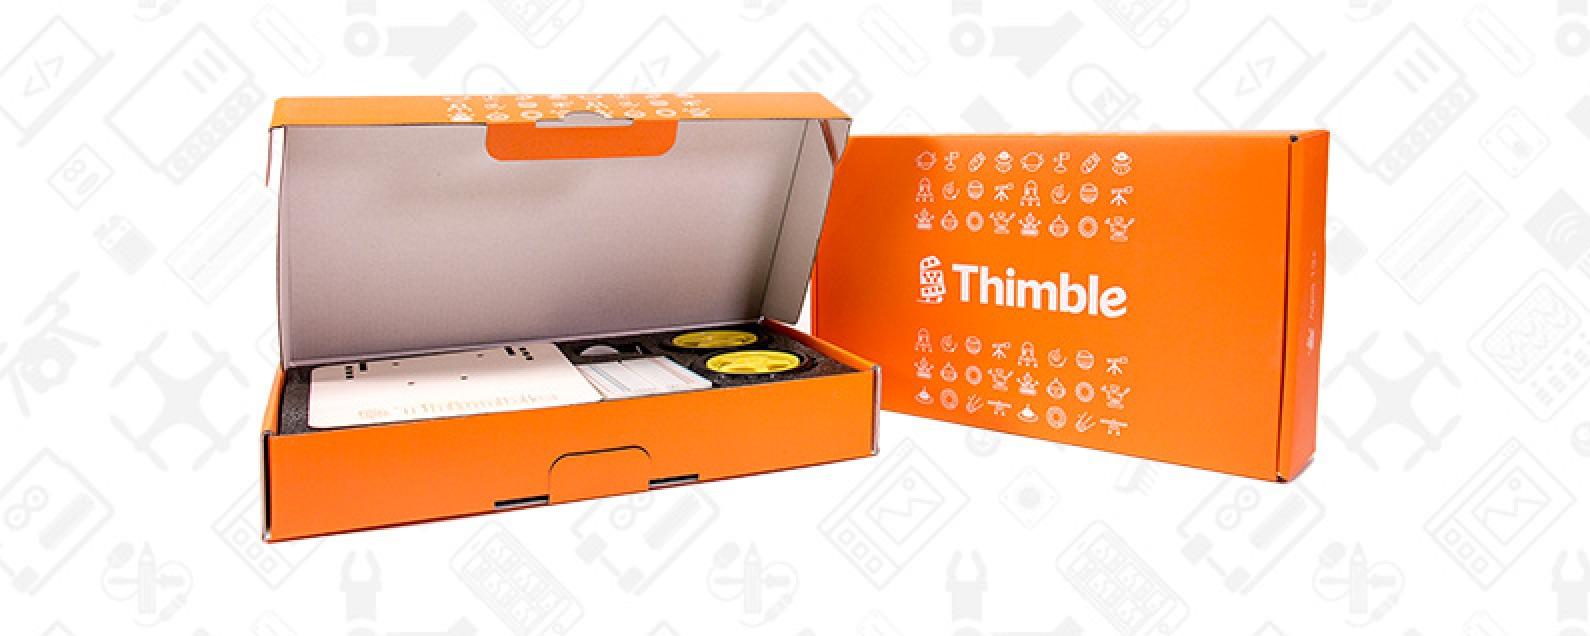 Thimble Kits Introduce Kids to STEM through Play